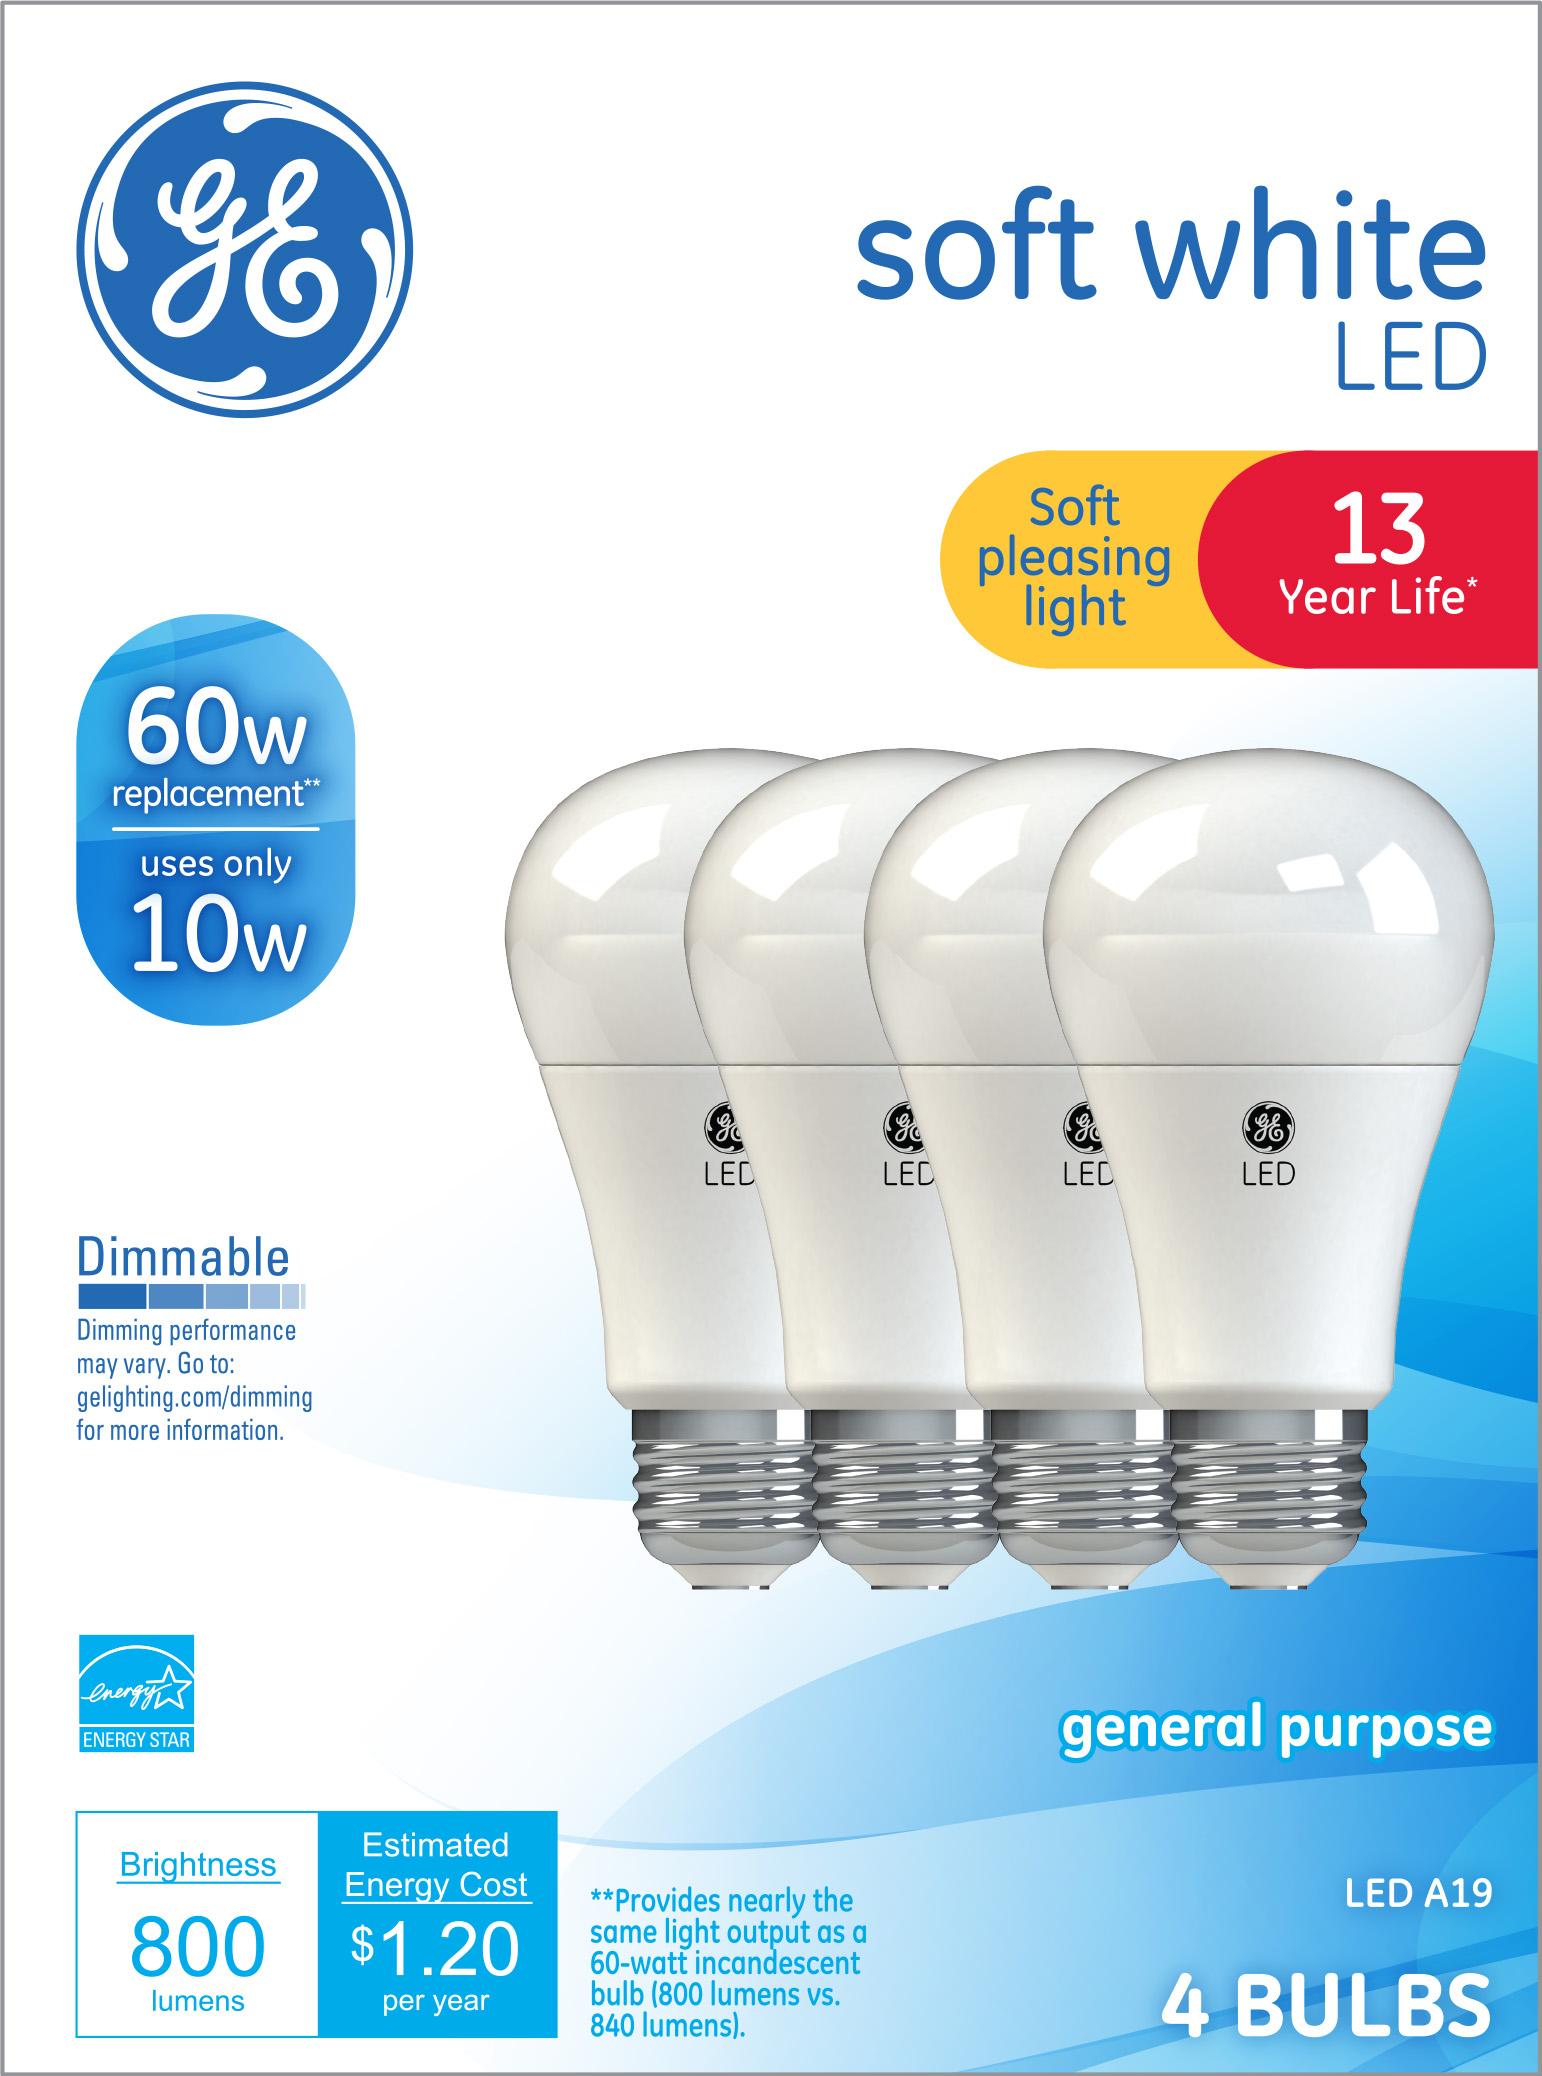 Walmart Clearance - 4 Pack 60W Equivalent GE LED Bulbs $0.97 (Reg $8,97)